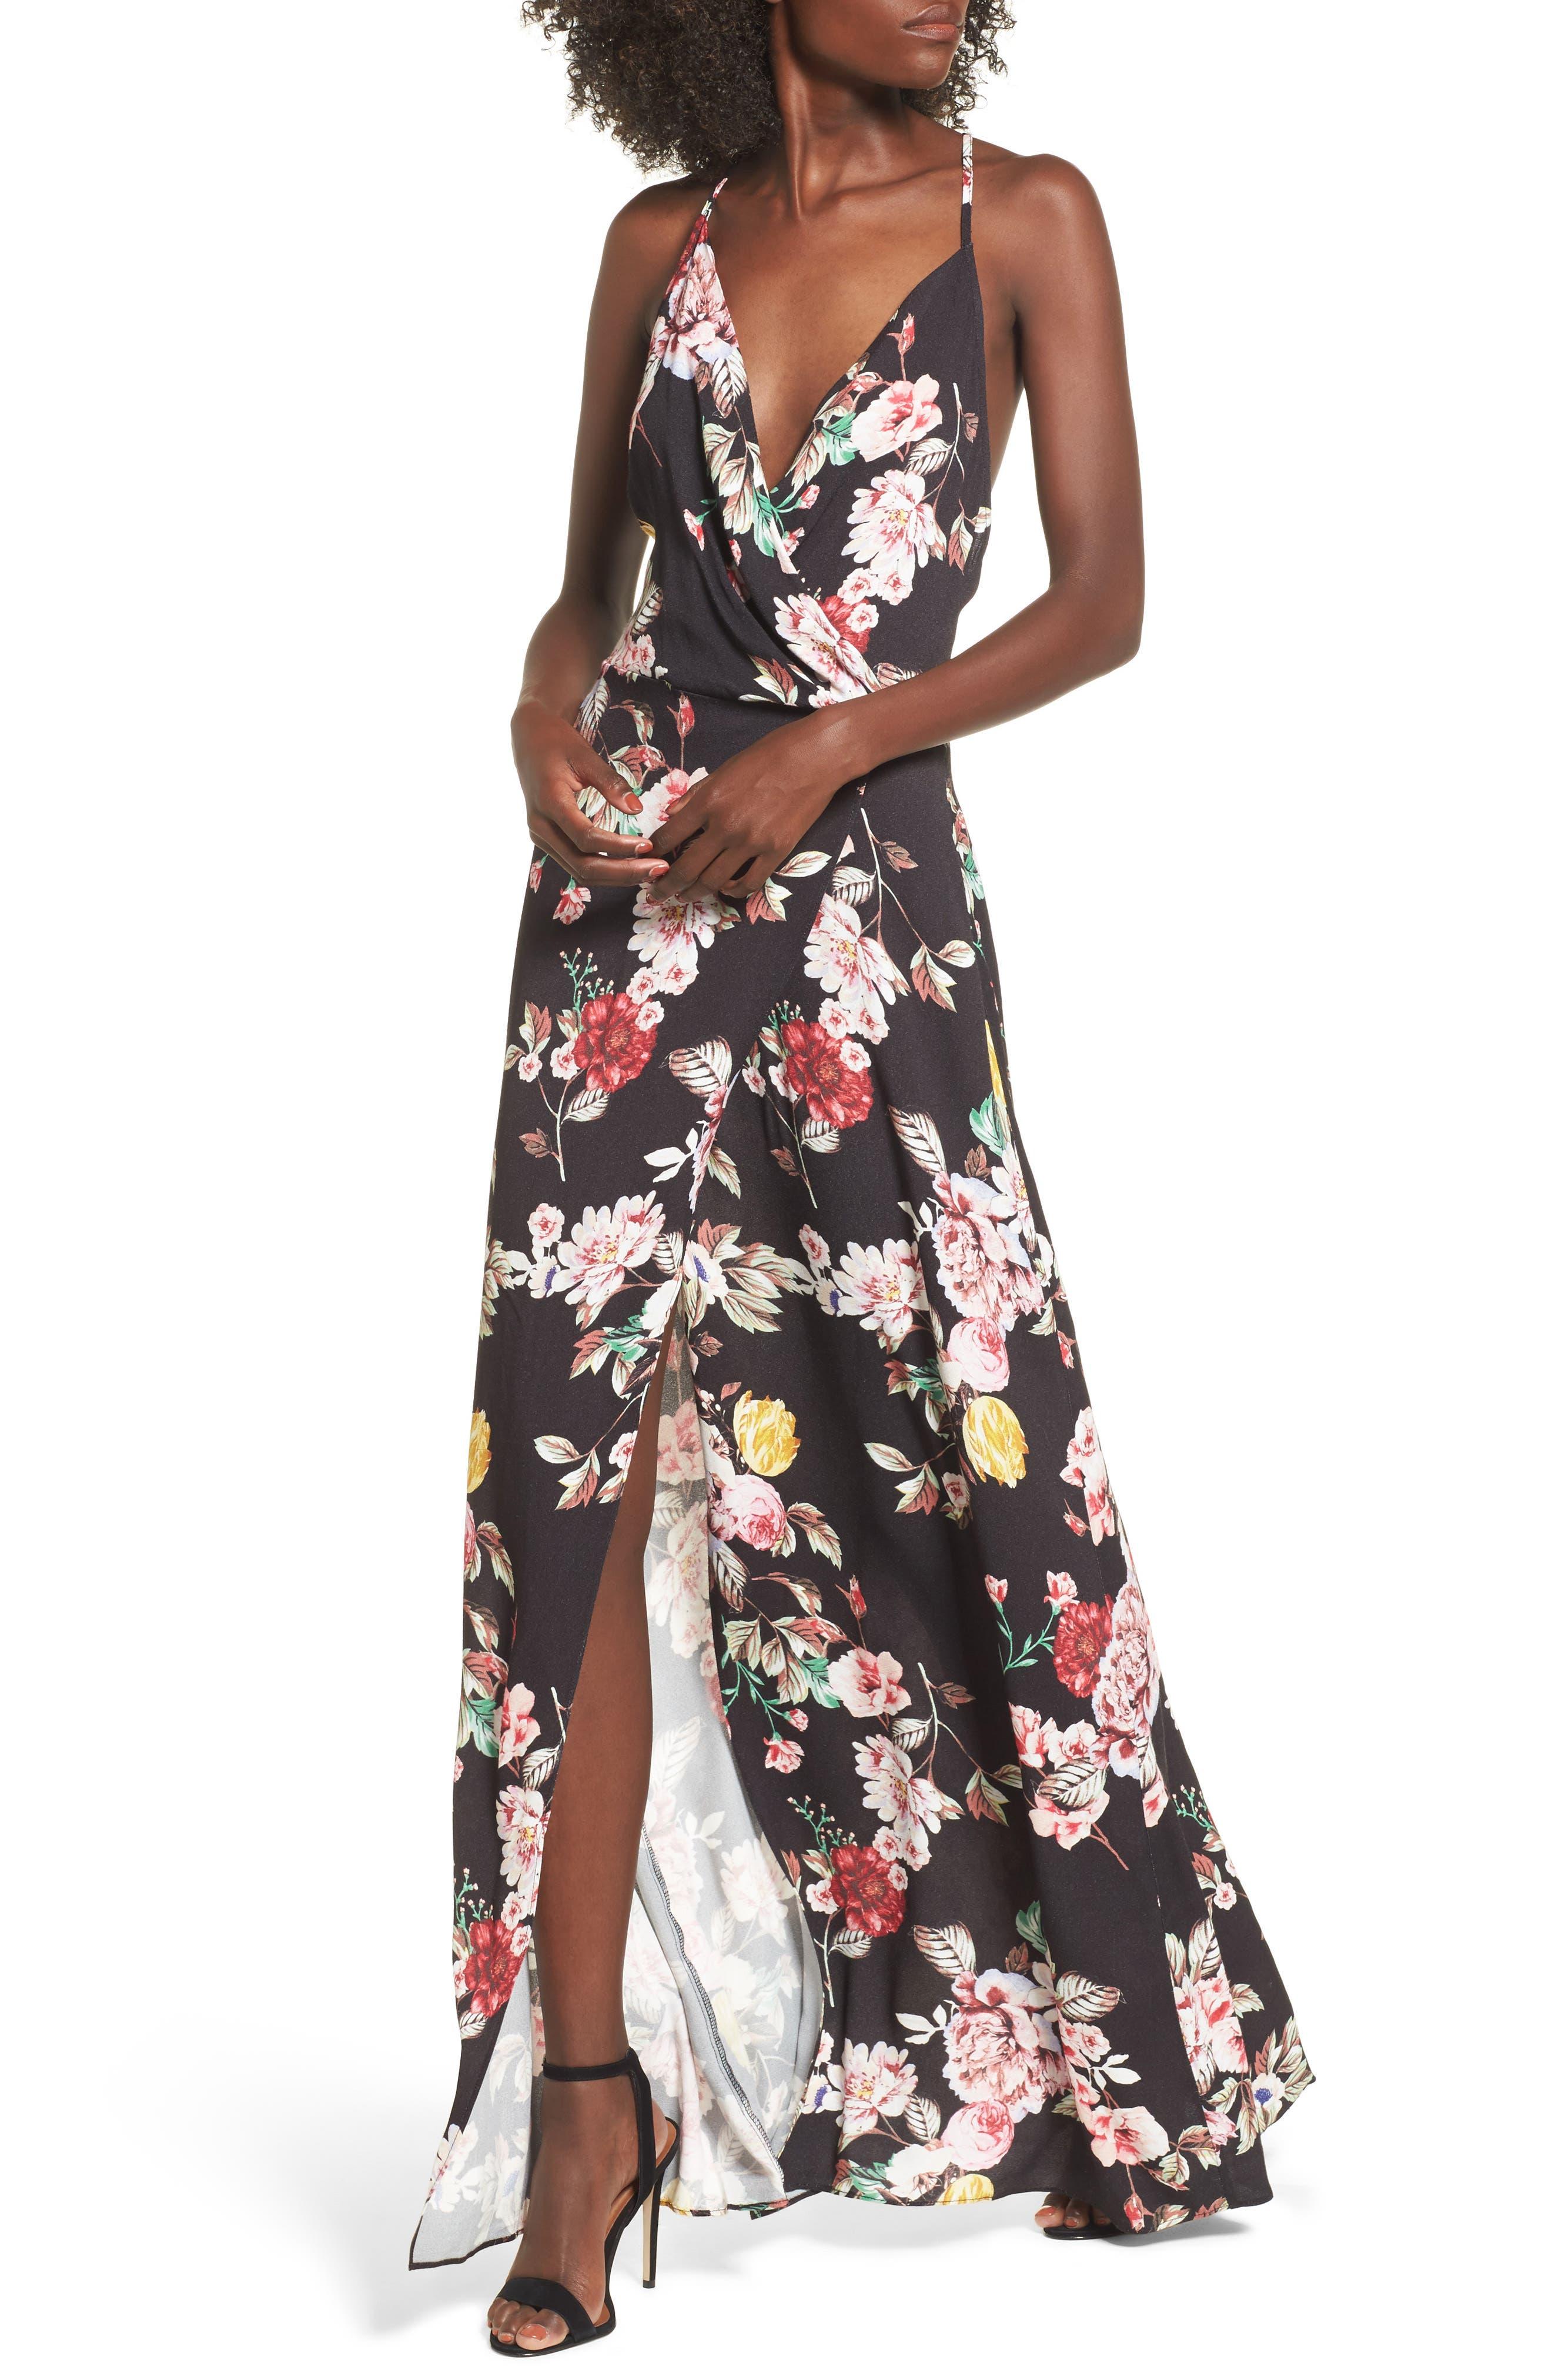 Main Image - AFRM Kinsely Faux-Wrap Maxi Dress